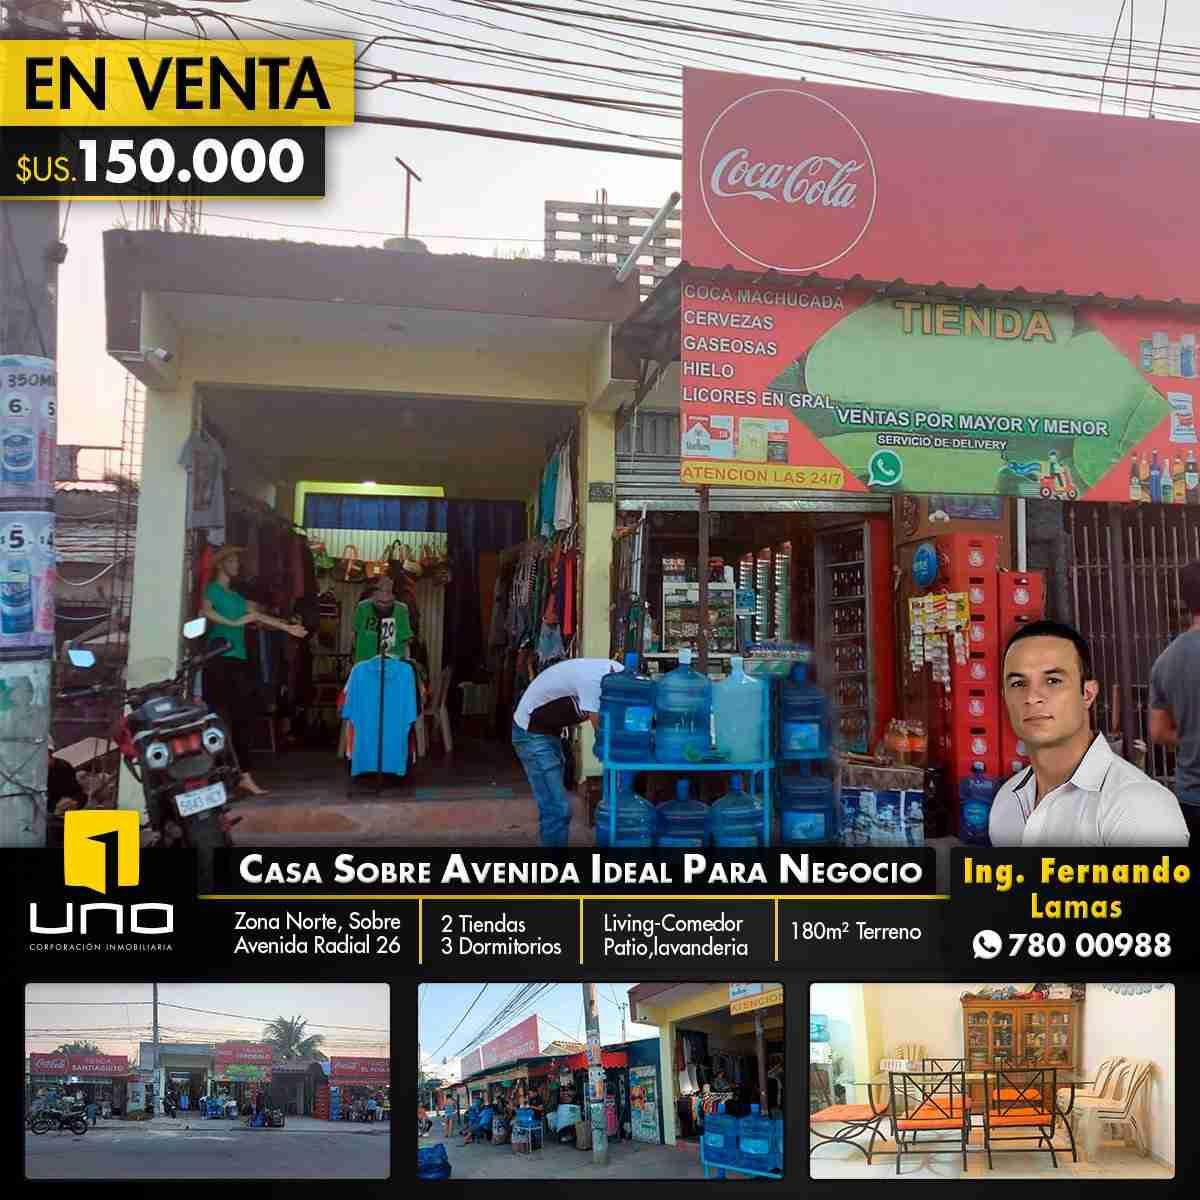 VENTA DE CASA SOBRE AVENIDA RADIAL 26, IDEAL PARA NEGOCIO O VIVIENDA